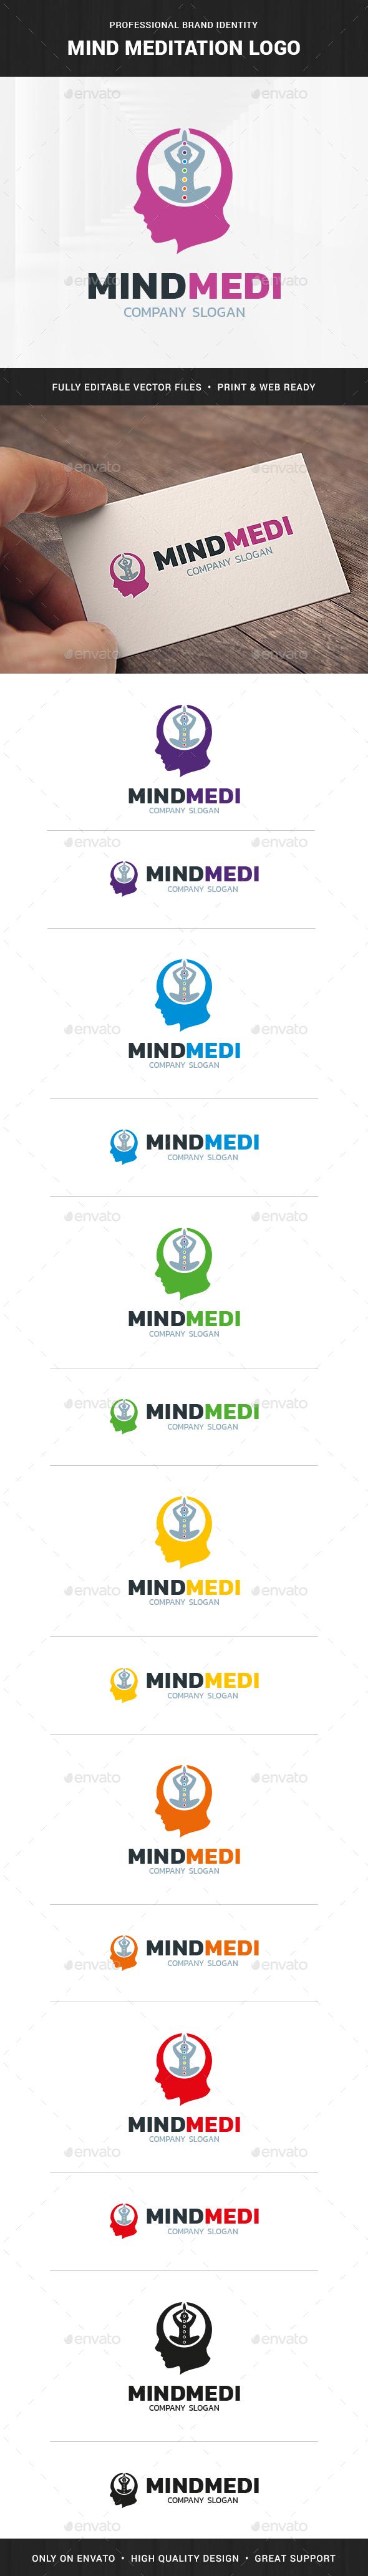 Mind Meditation Logo Template